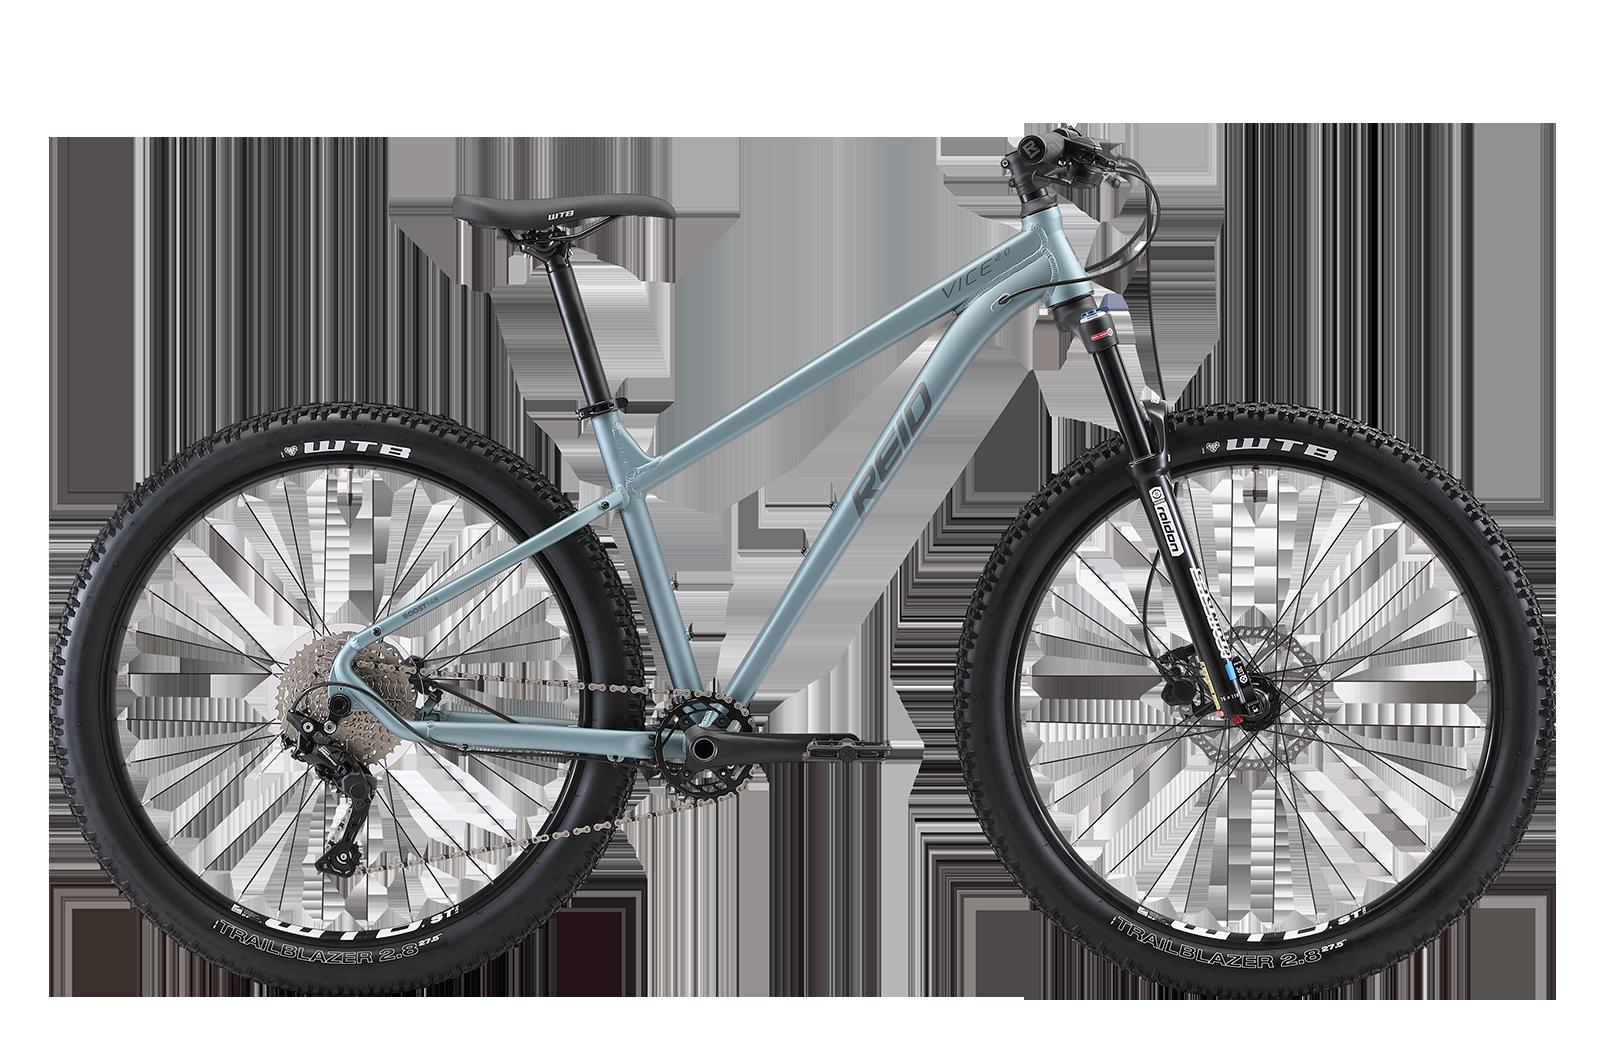 IMG 0118 ¦¦ - Reid ® - Vice 2.0 Bike